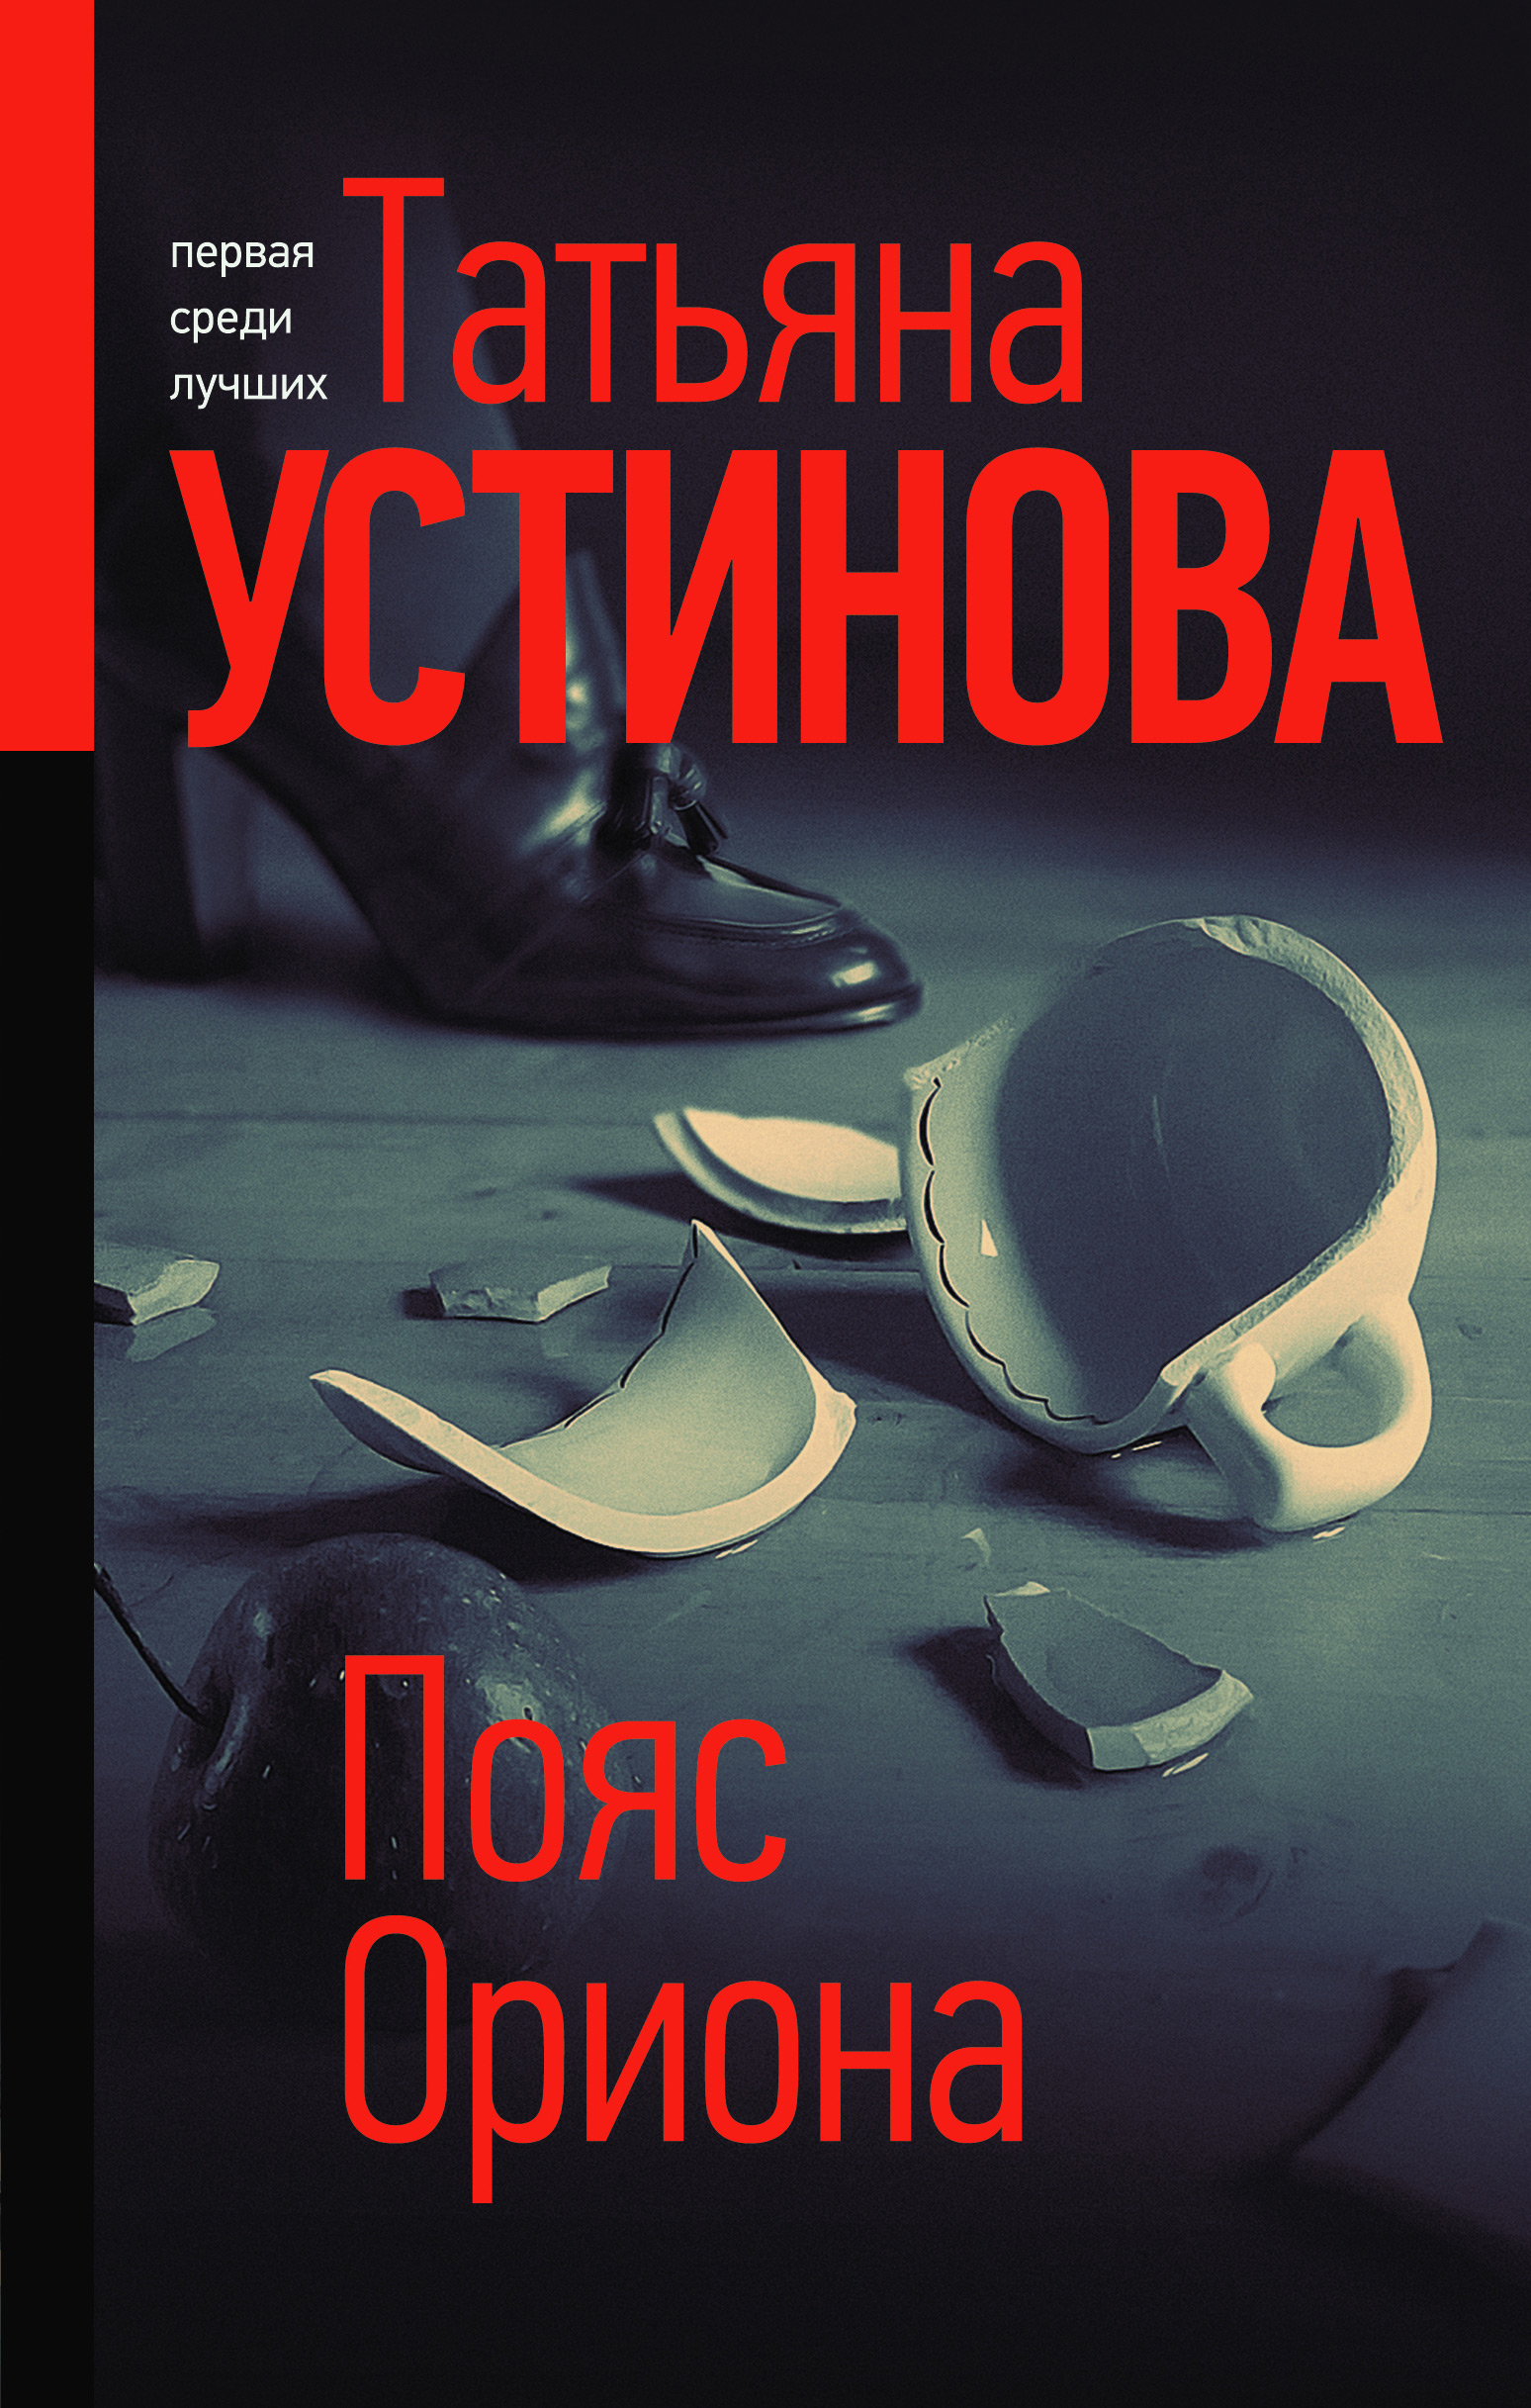 http://chelib.ru/wp-content/uploads/img/books/ustinova-poyas-oriona.jpg